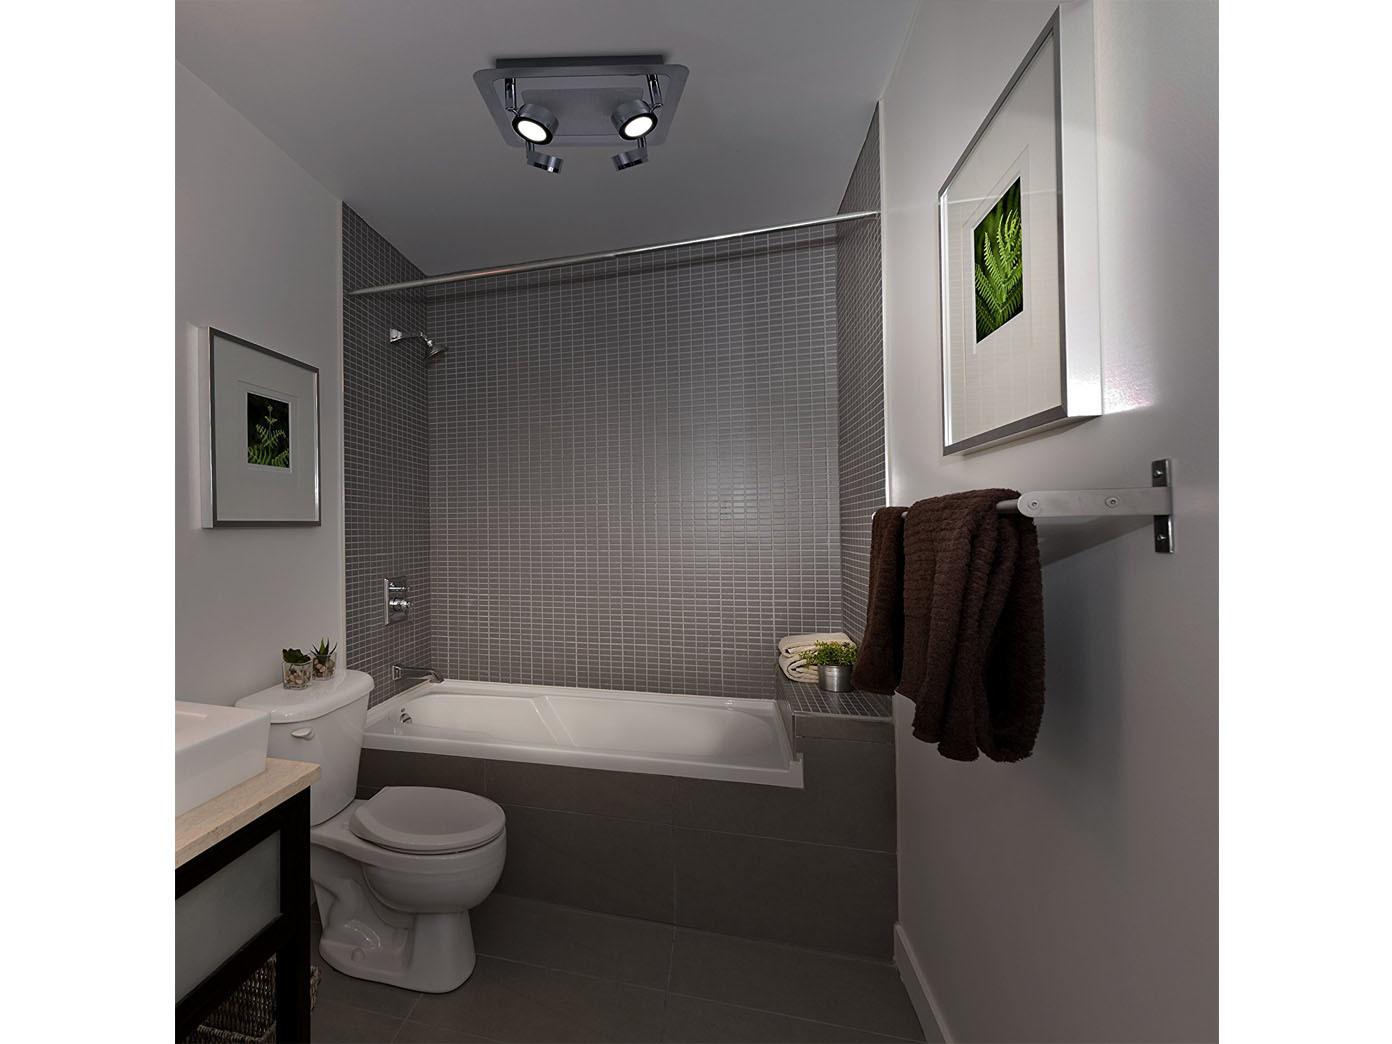 2stk led badlampen deckenleuchten schwenkbare deckspots 4flammig badbeleuchtung ebay. Black Bedroom Furniture Sets. Home Design Ideas